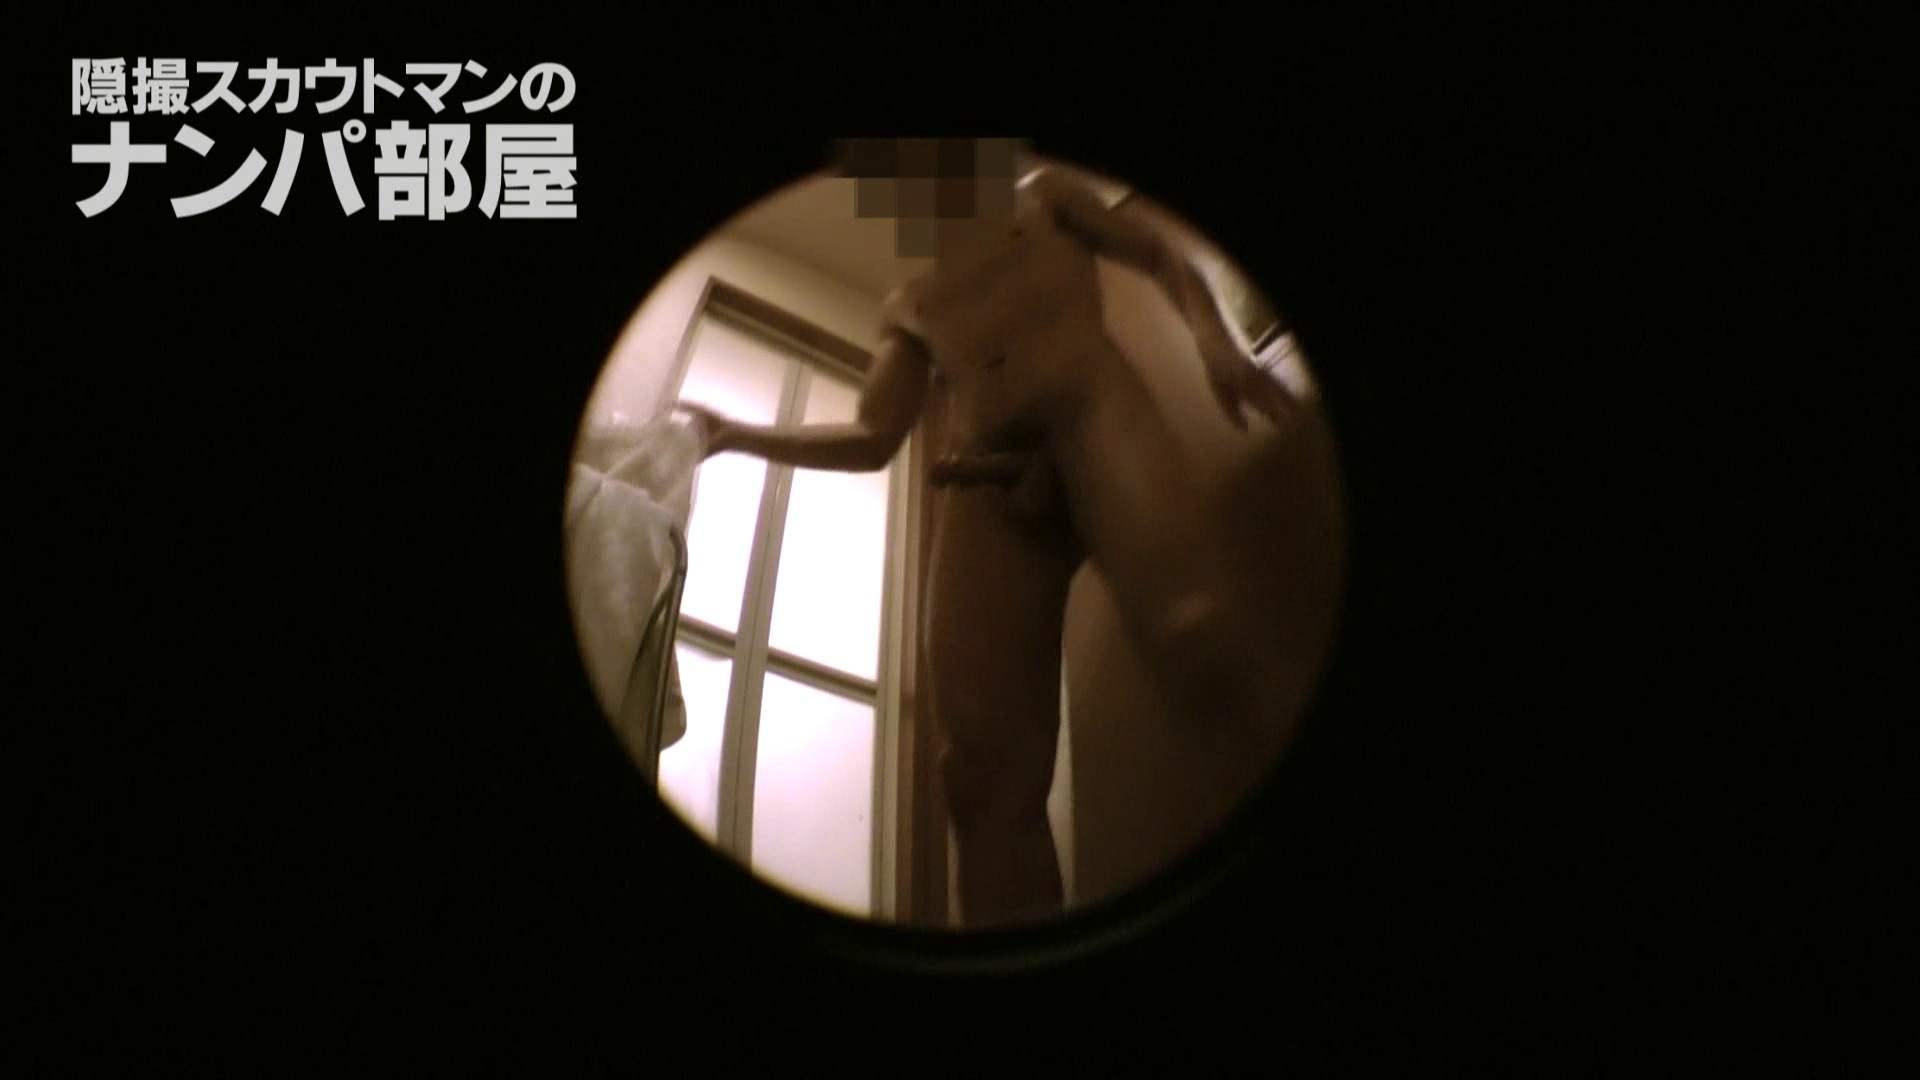 vol.2 sii 脱衣所・着替え編   ナンパ  95pic 22